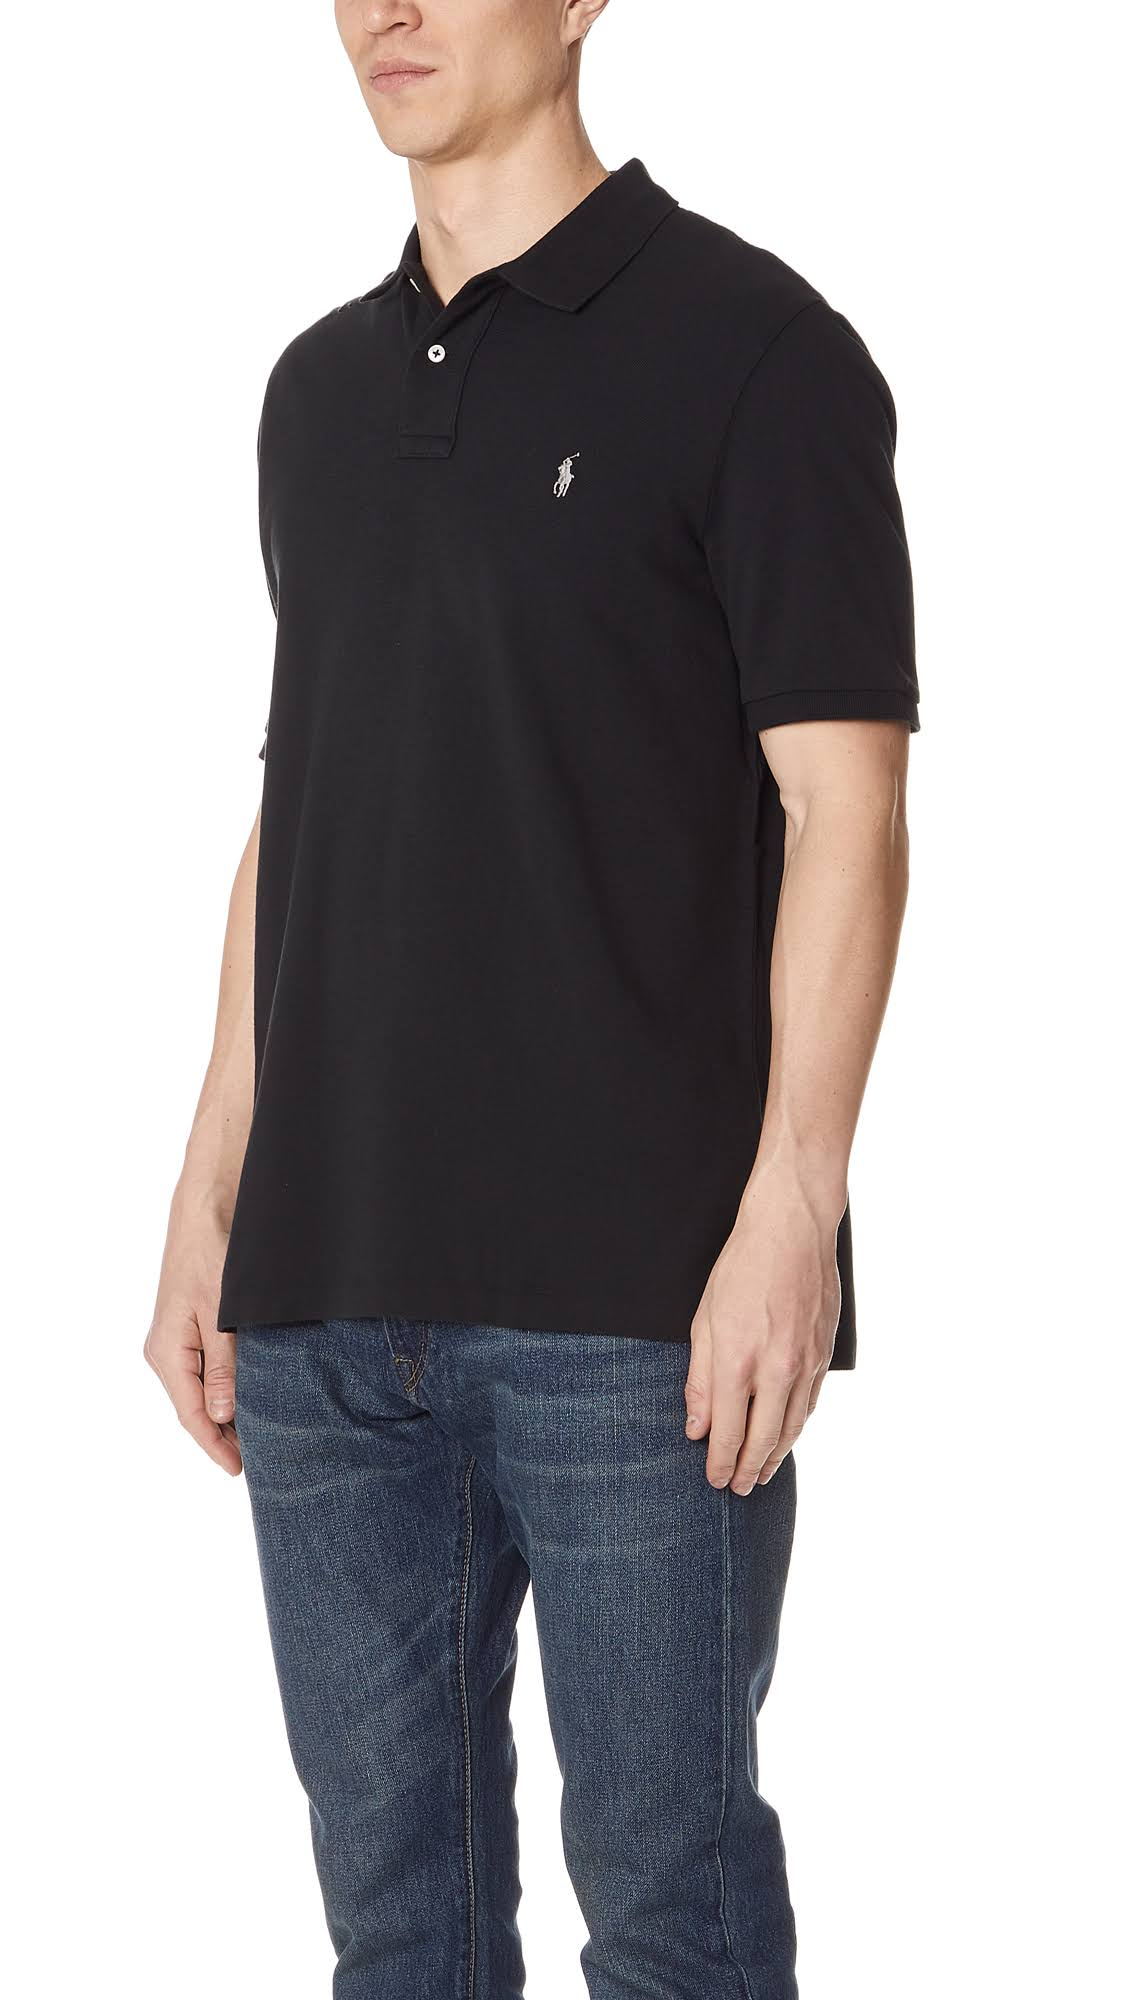 Negro Polo Ralph Camisa Classic Fit L Lauren 668wqvX